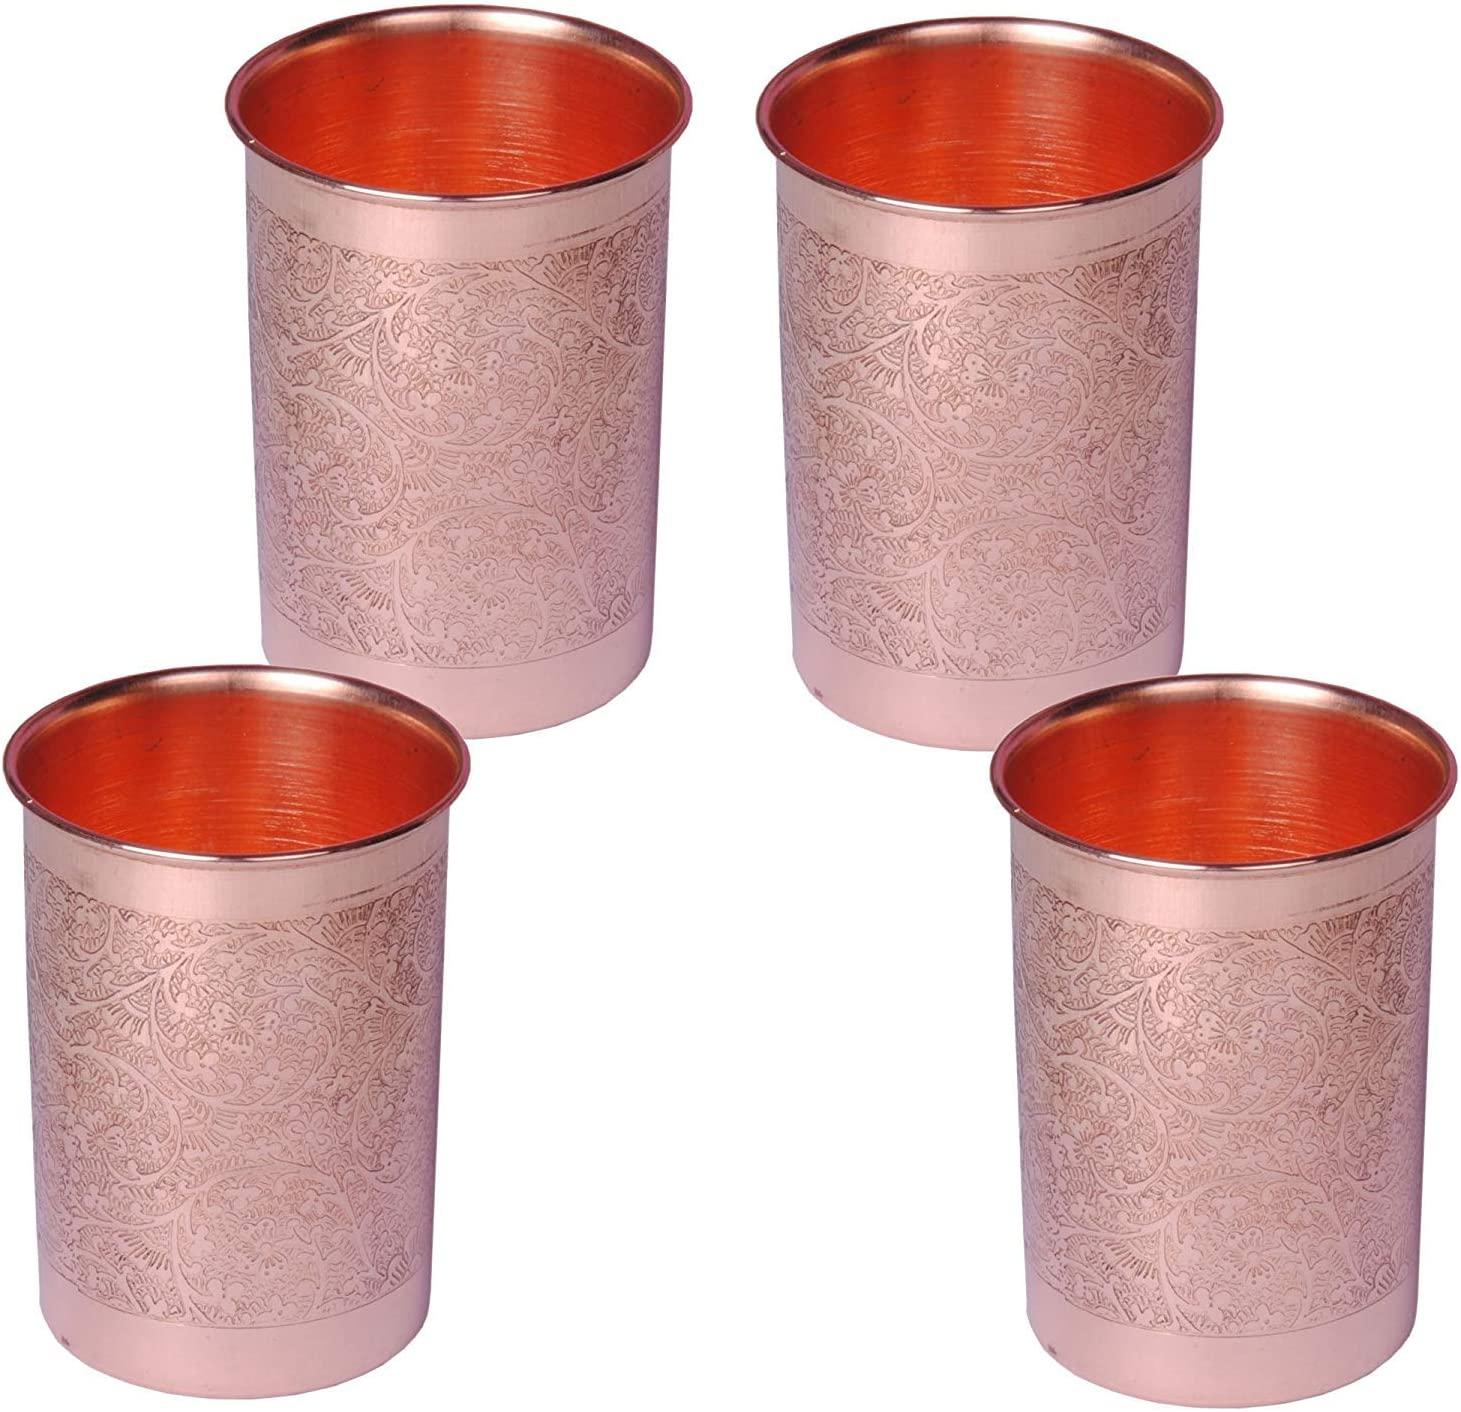 SHIV SHAKTI ARTS Set Of 4 Handmade Pure Copper Glass Embossed Designed With Flat Base Volume=300 ml each